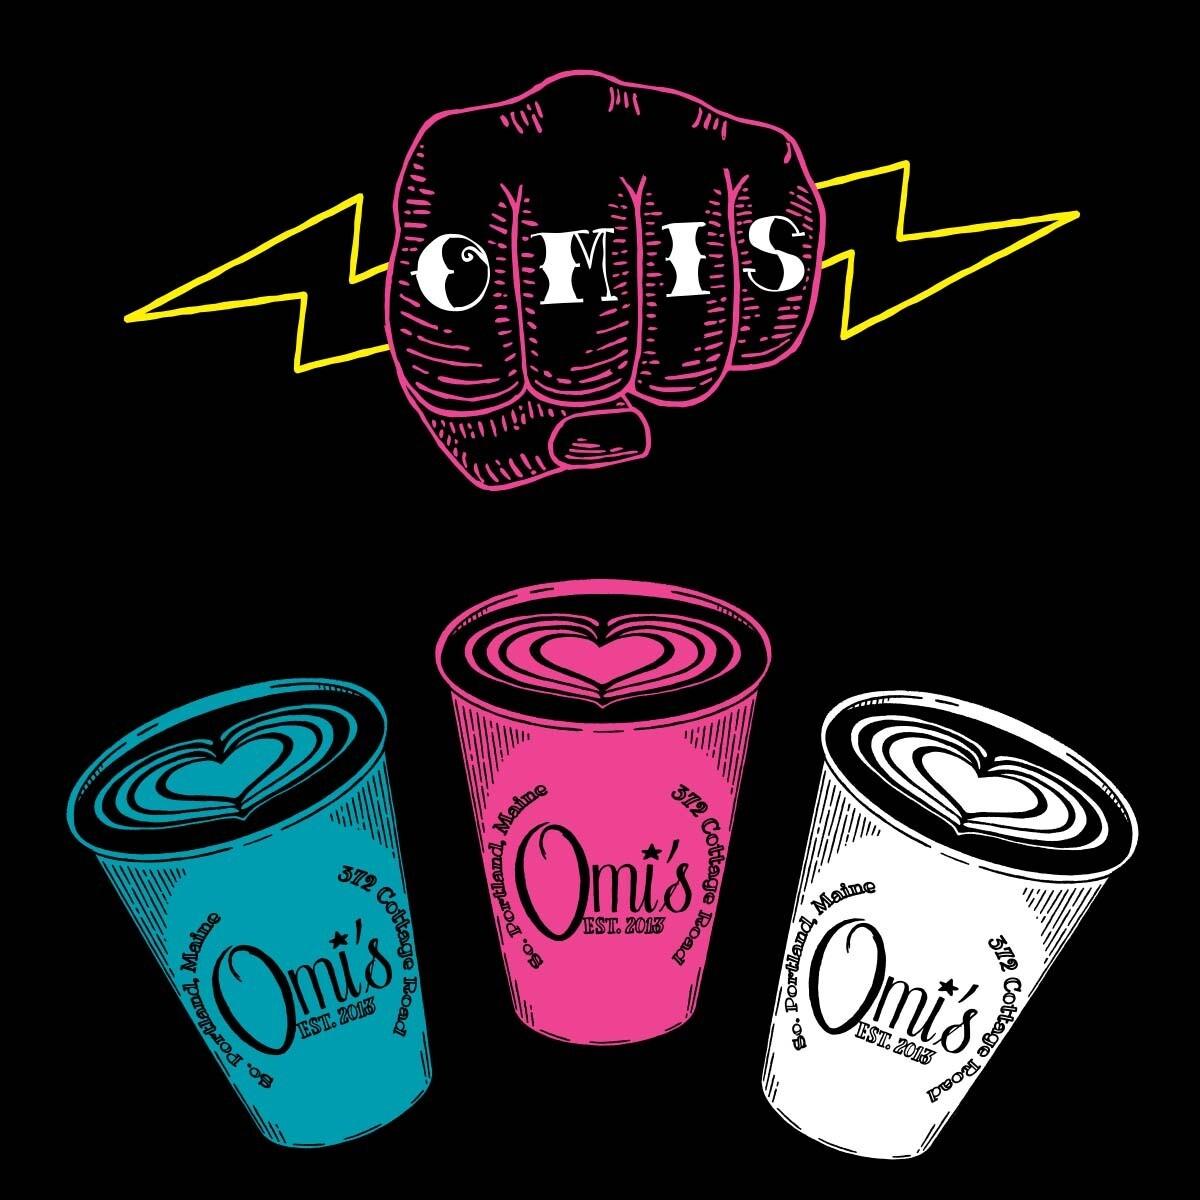 Omi's Merch